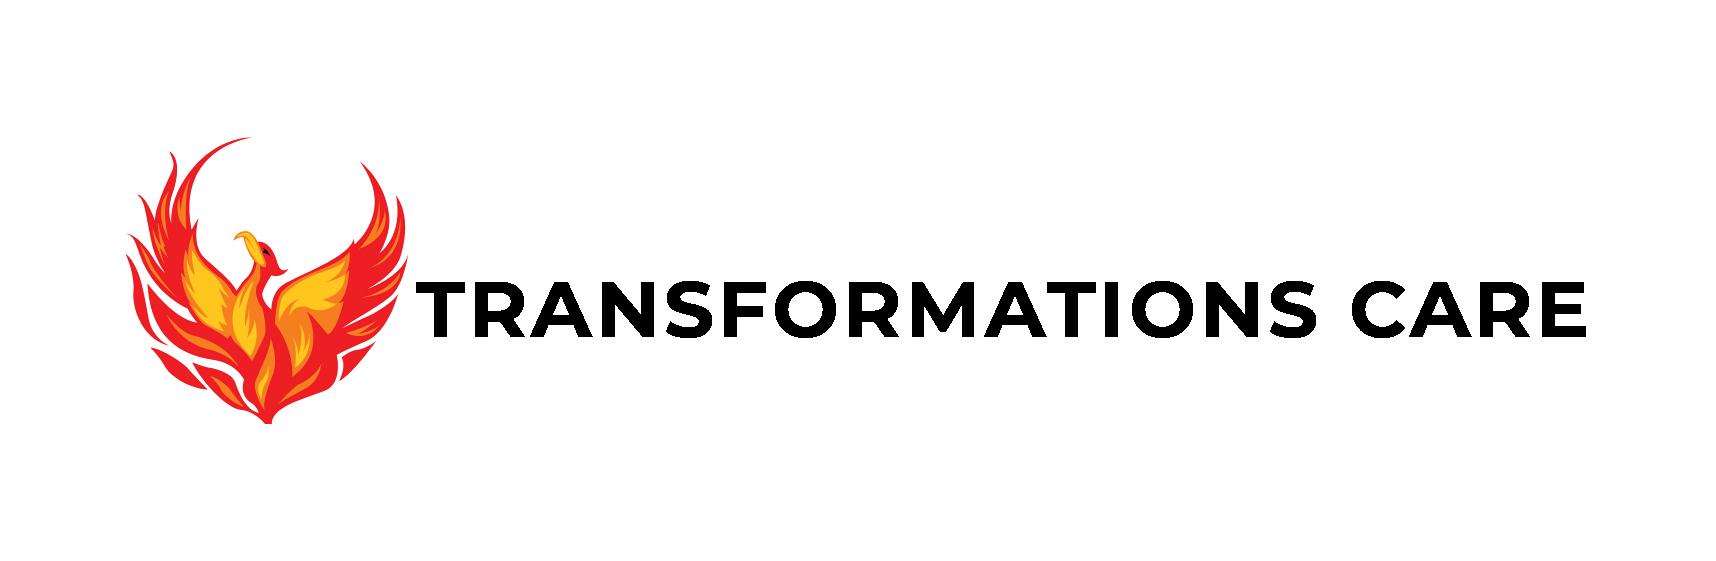 Transformations Care Logo Horizontal-1